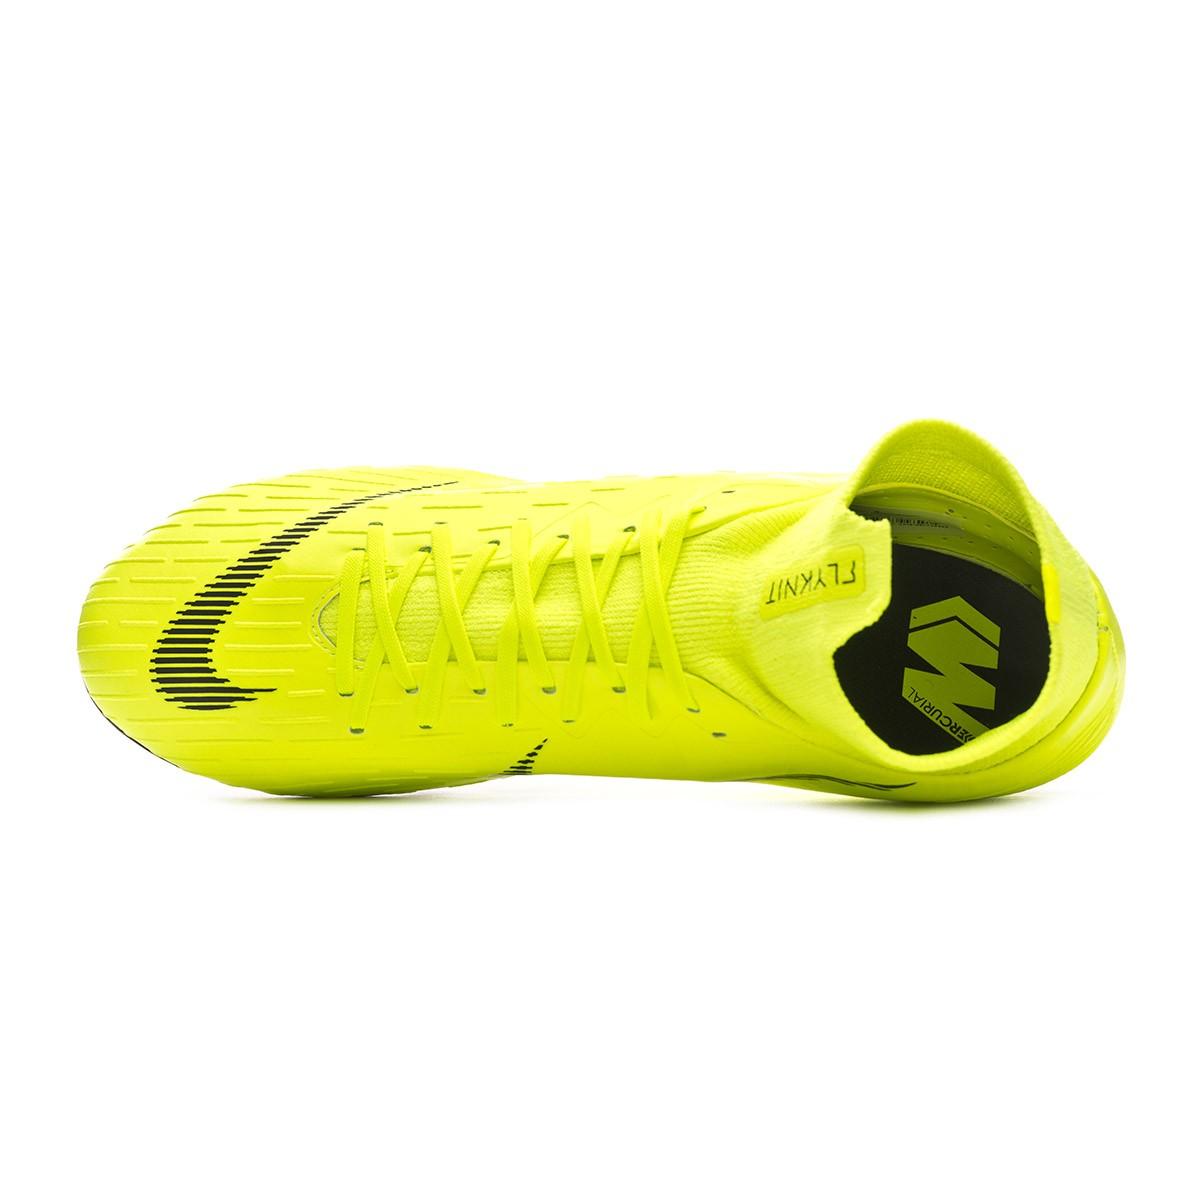 d0ab755d468 Football Boots Nike Mercurial Superfly VI Pro AG-Pro Volt-Black - Football  store Fútbol Emotion